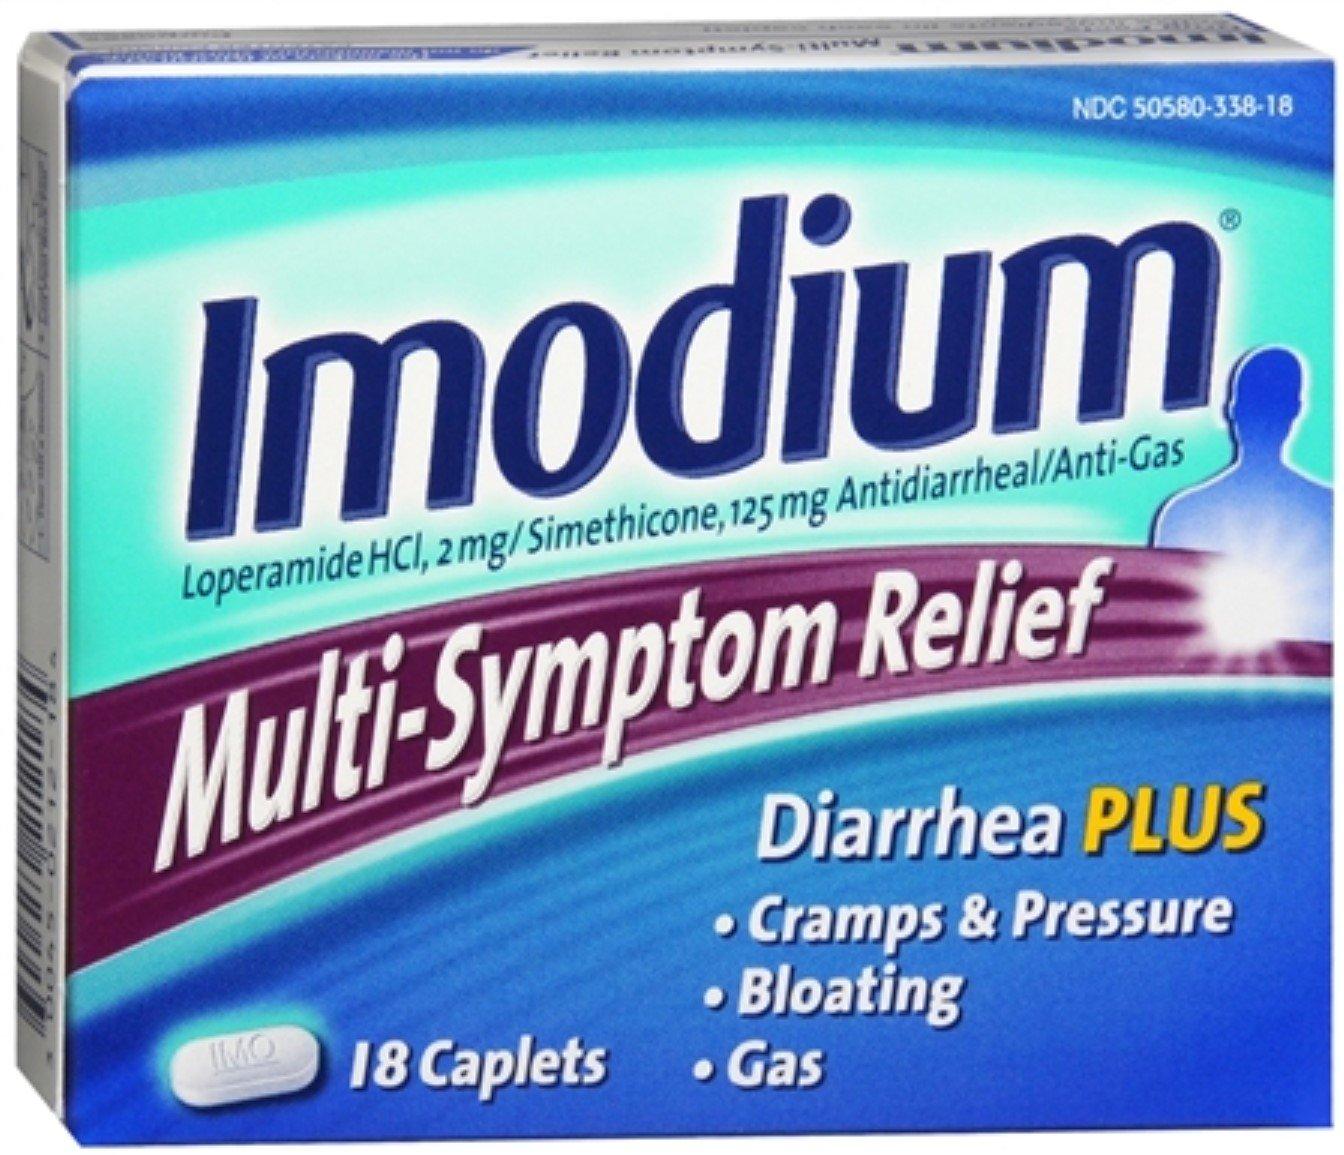 Imodium Multi-Symptom Relief Caplets 18 Caplets (12 Pack) by Pharmapacks